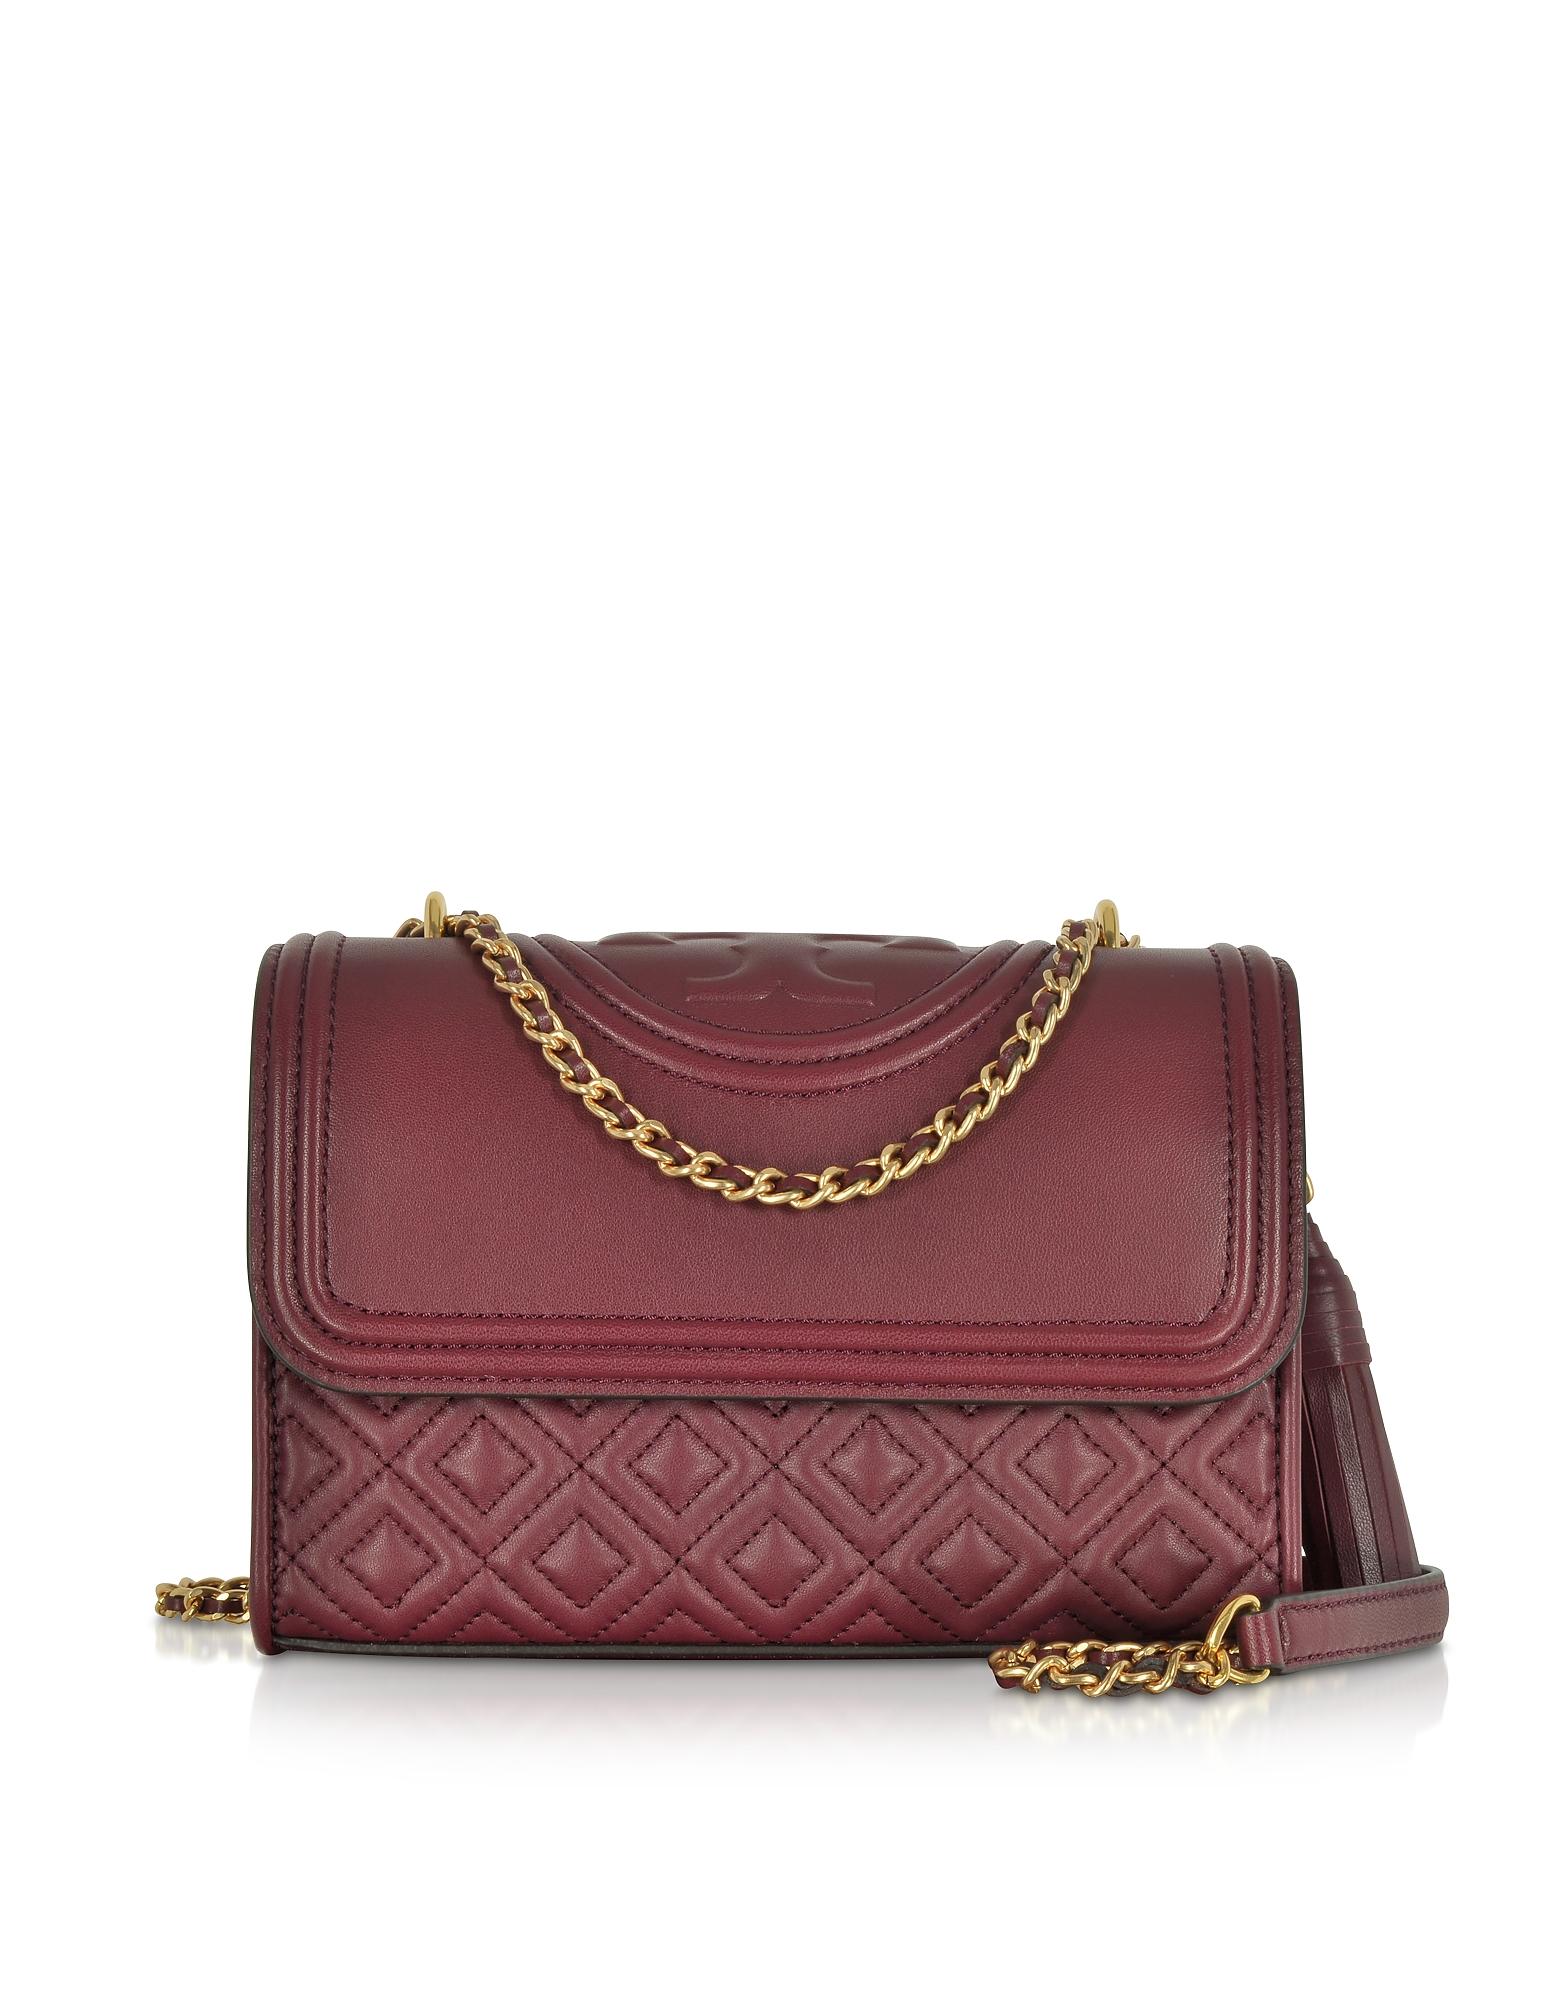 Tory Burch Handbags, Fleming Imperial Garnet Leather Small Convertible Shoulder Bag